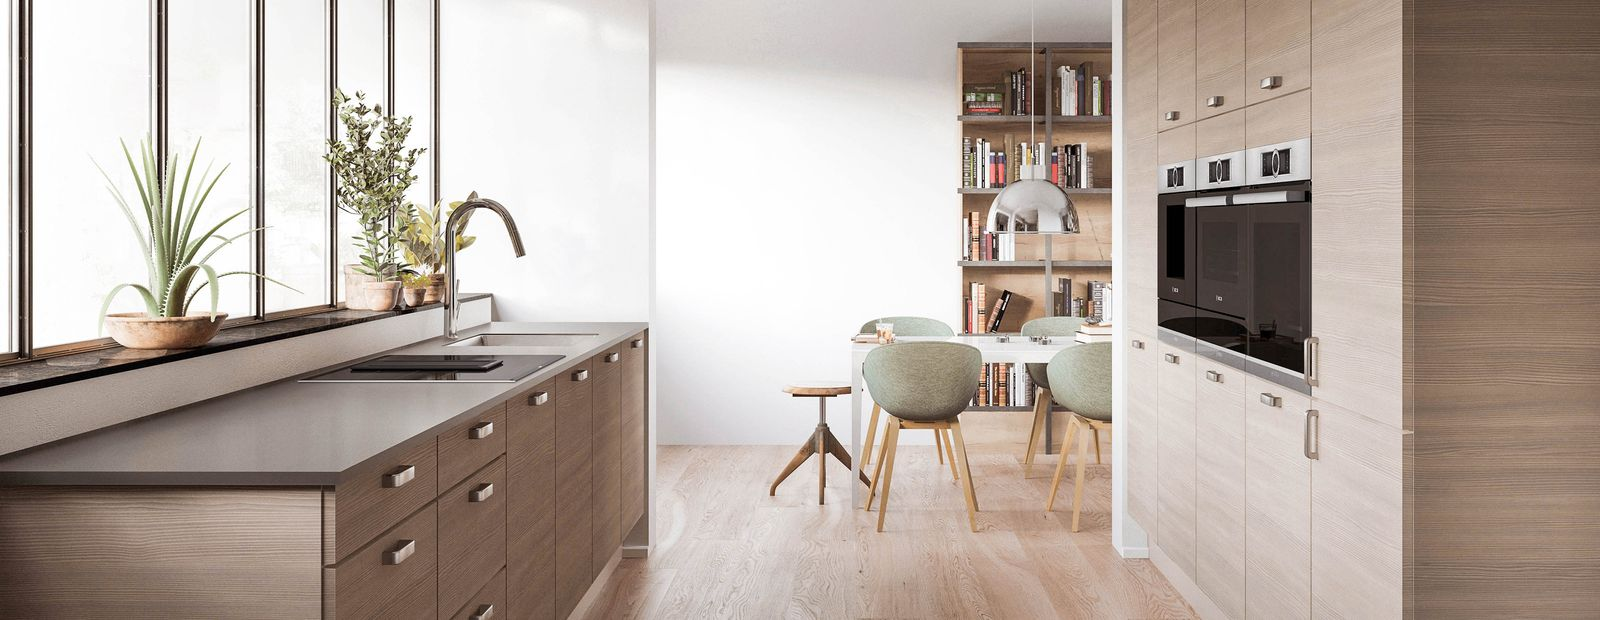 nieuwe keuken stappenplan BSH